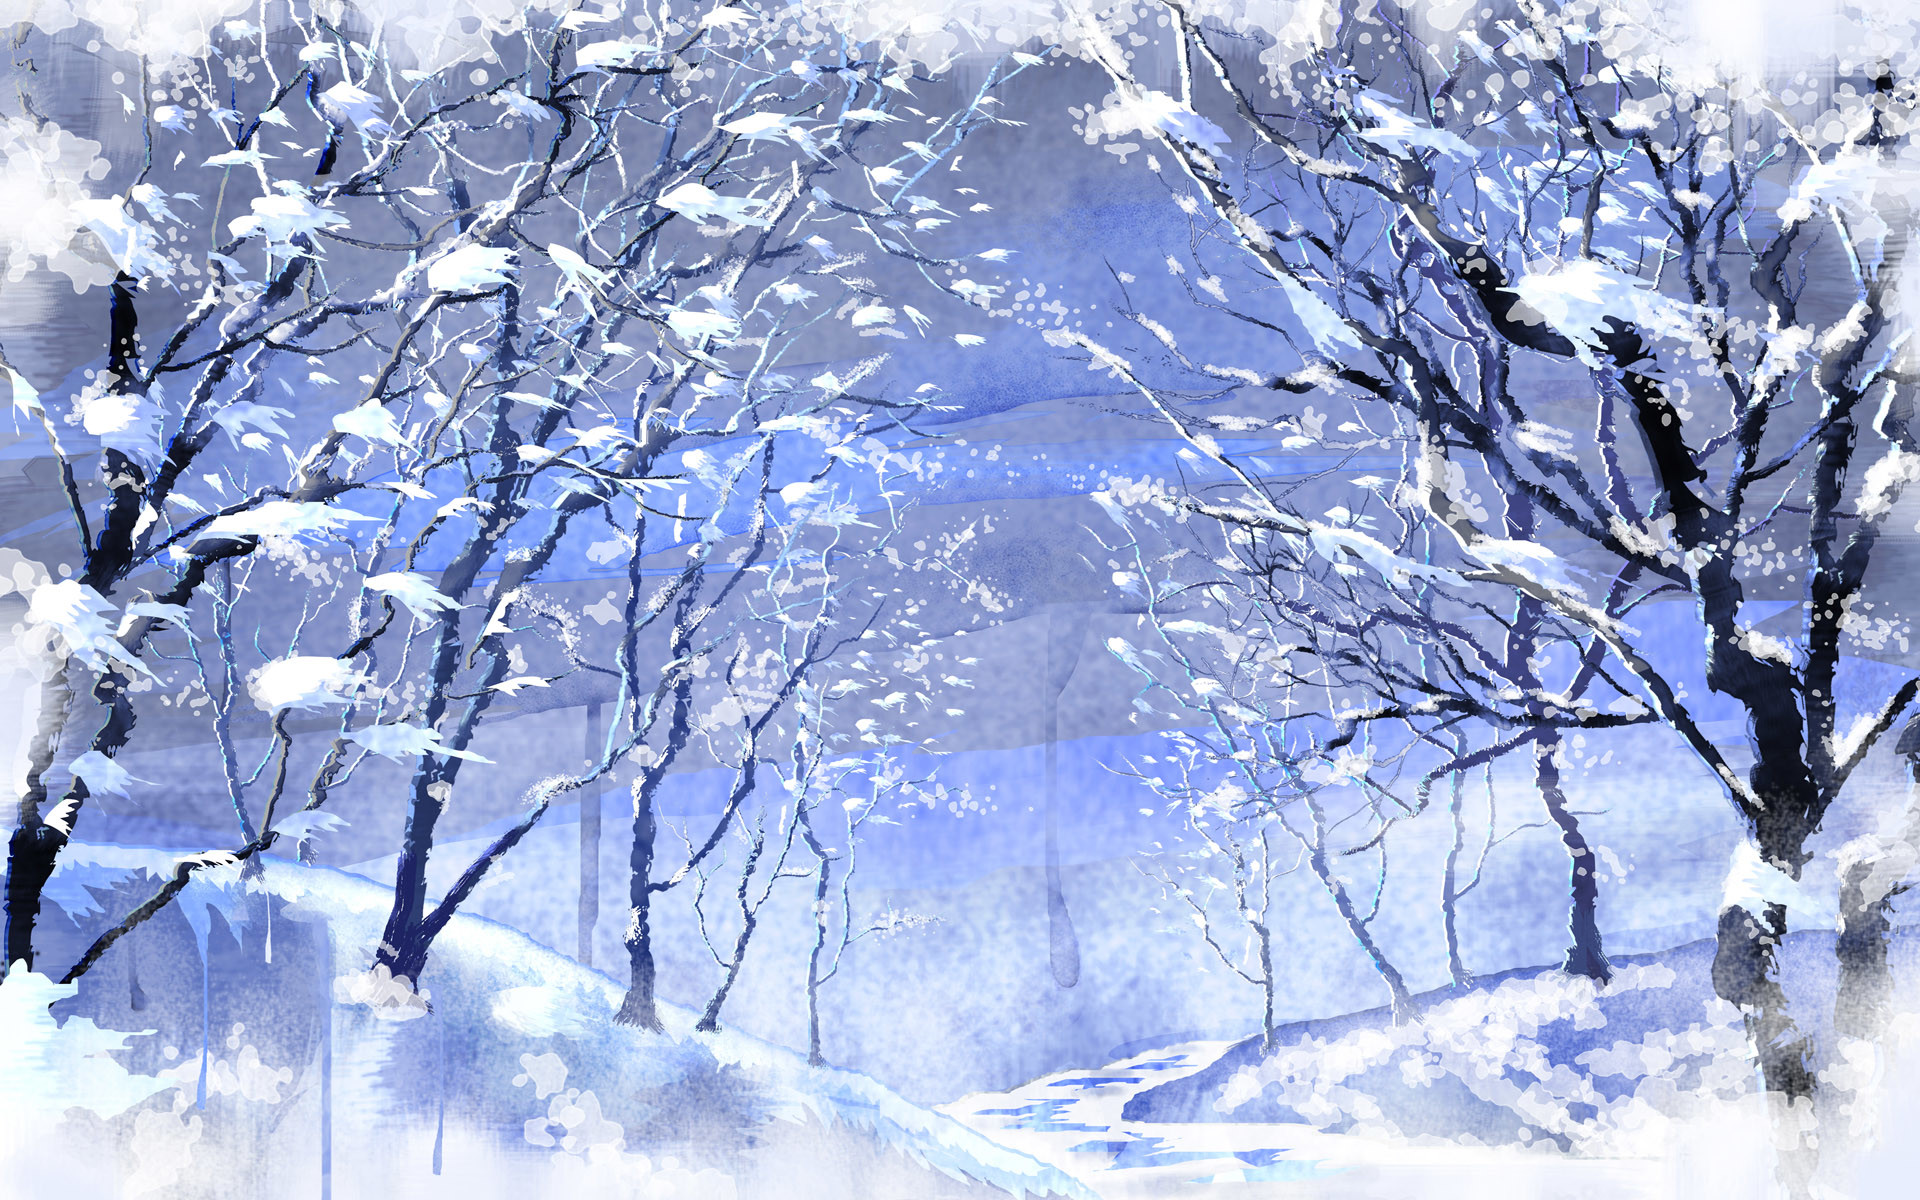 winter-scene-free-desktop-wallpaper-s-wallpaper .